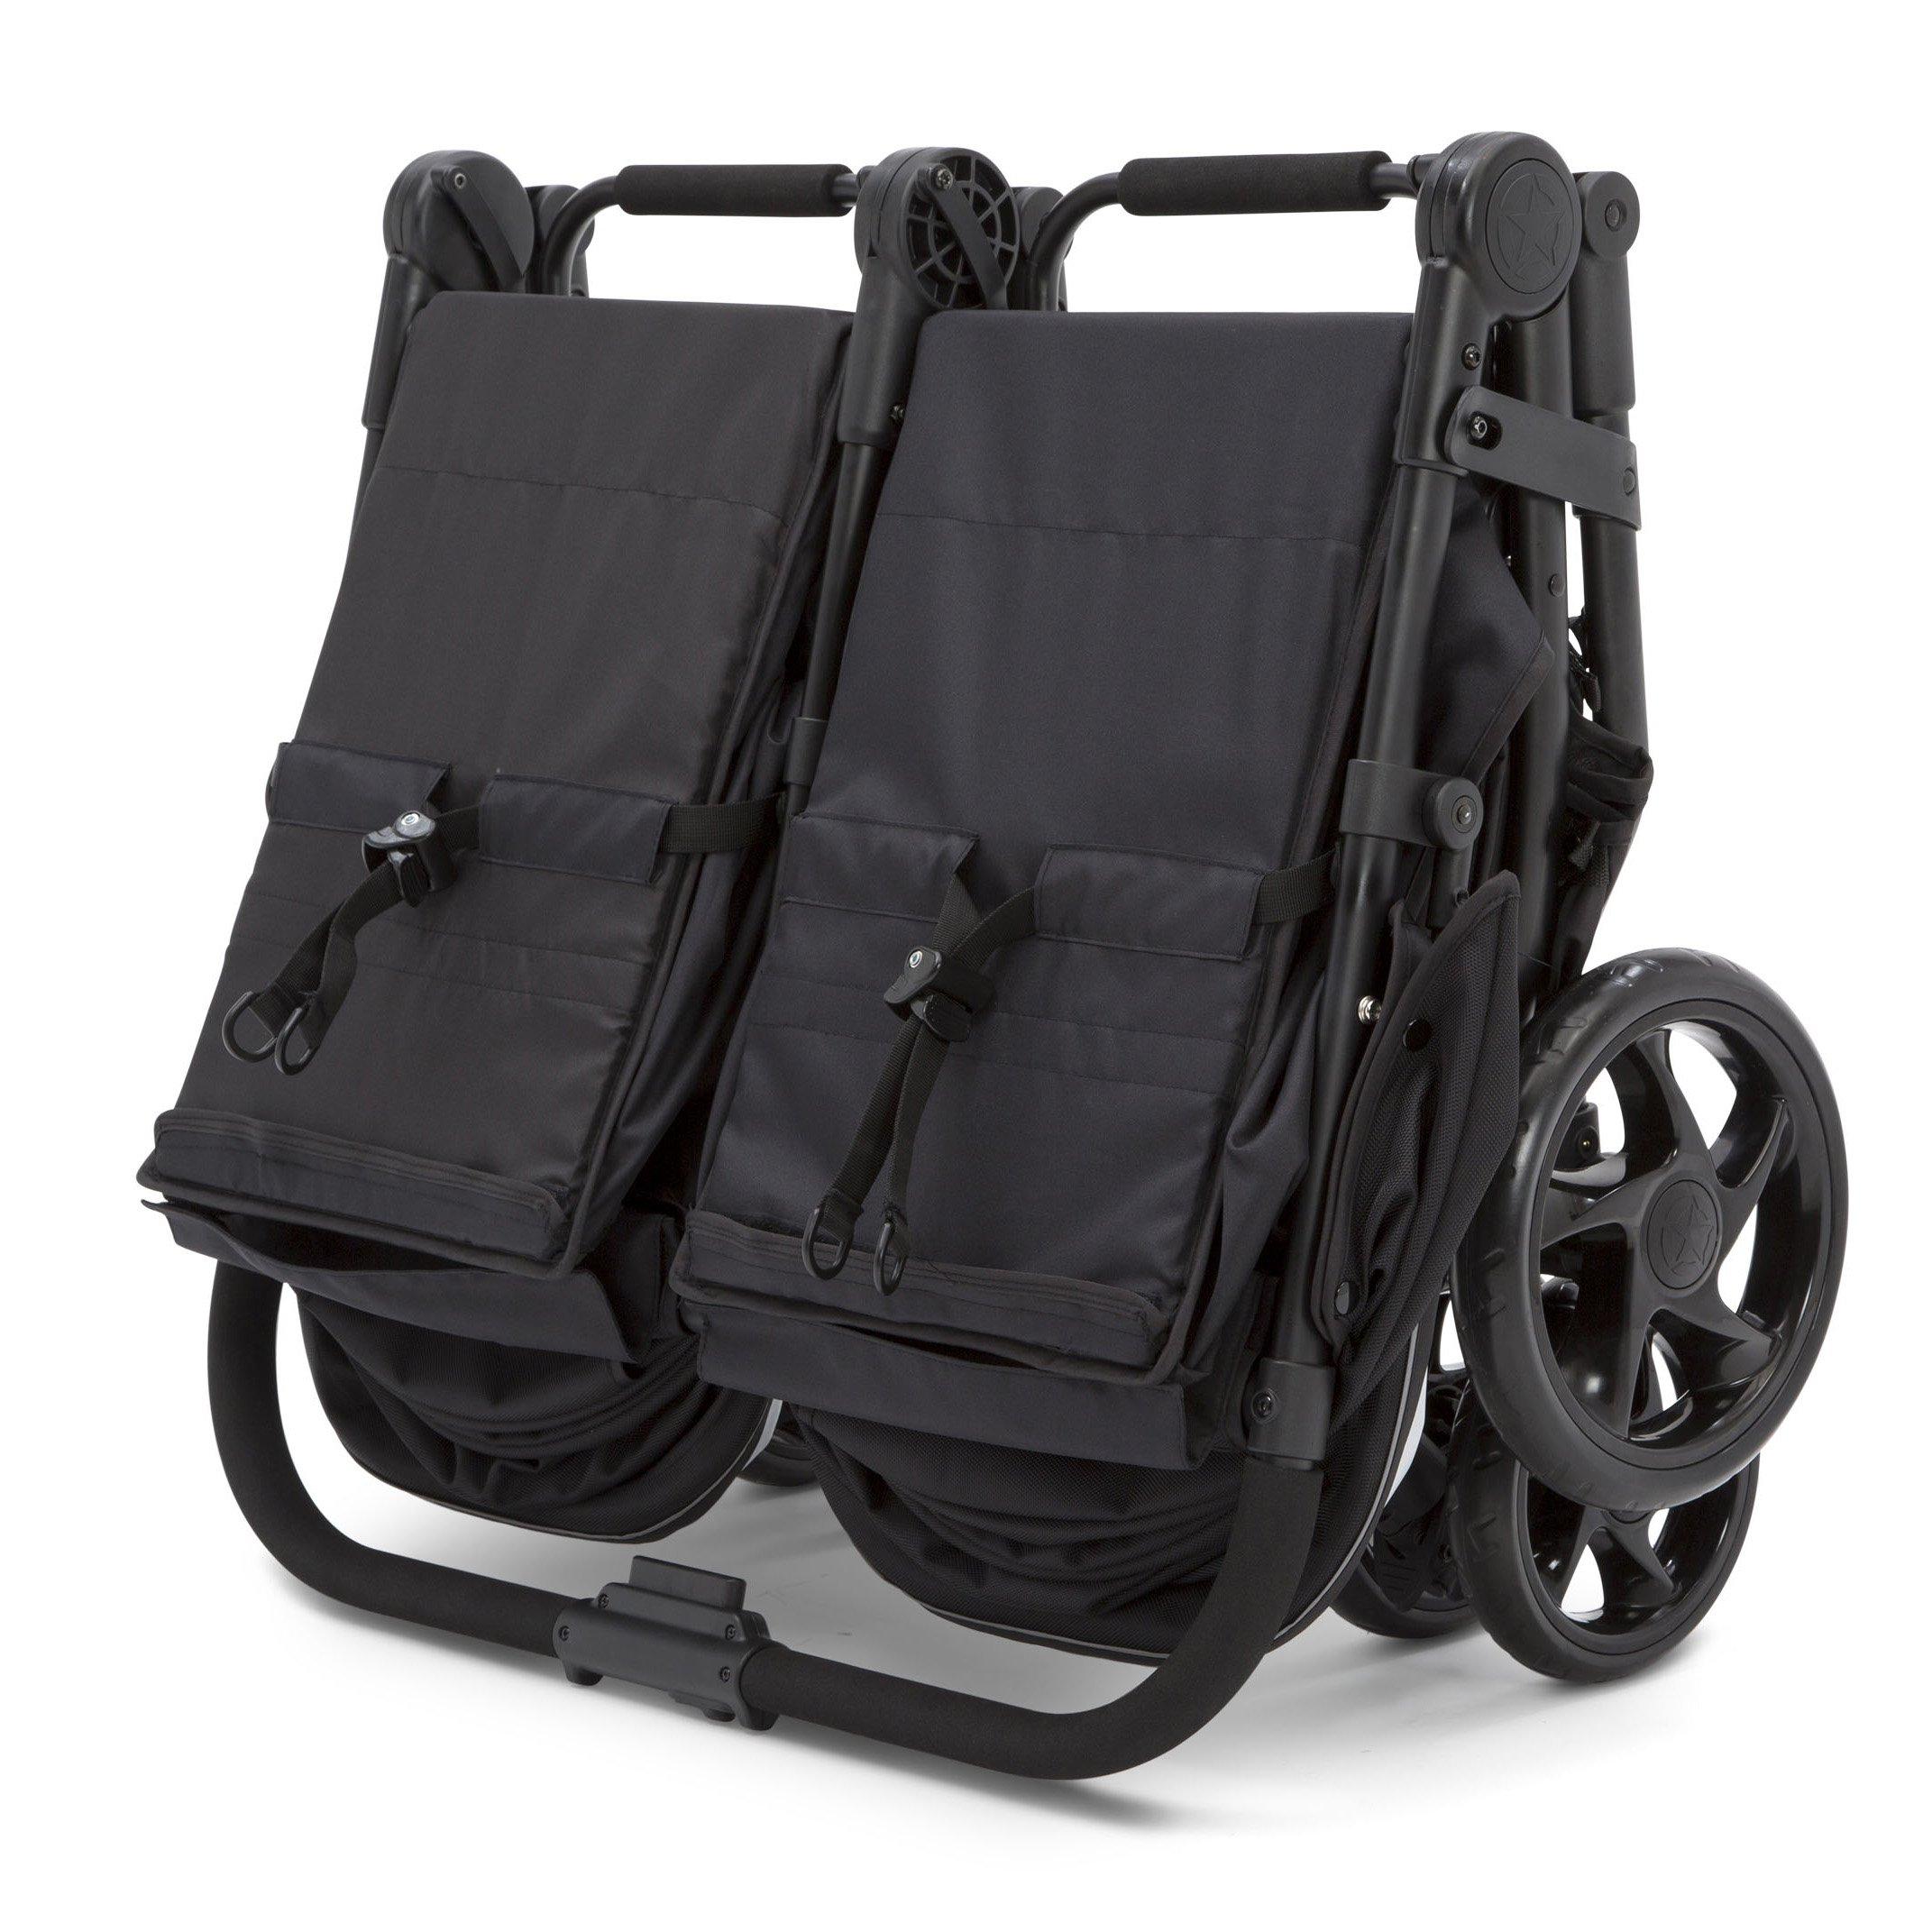 Jeep Destination Ultralight Side x Side Double Stroller, Midnight (Black) by Delta Children (Image #8)